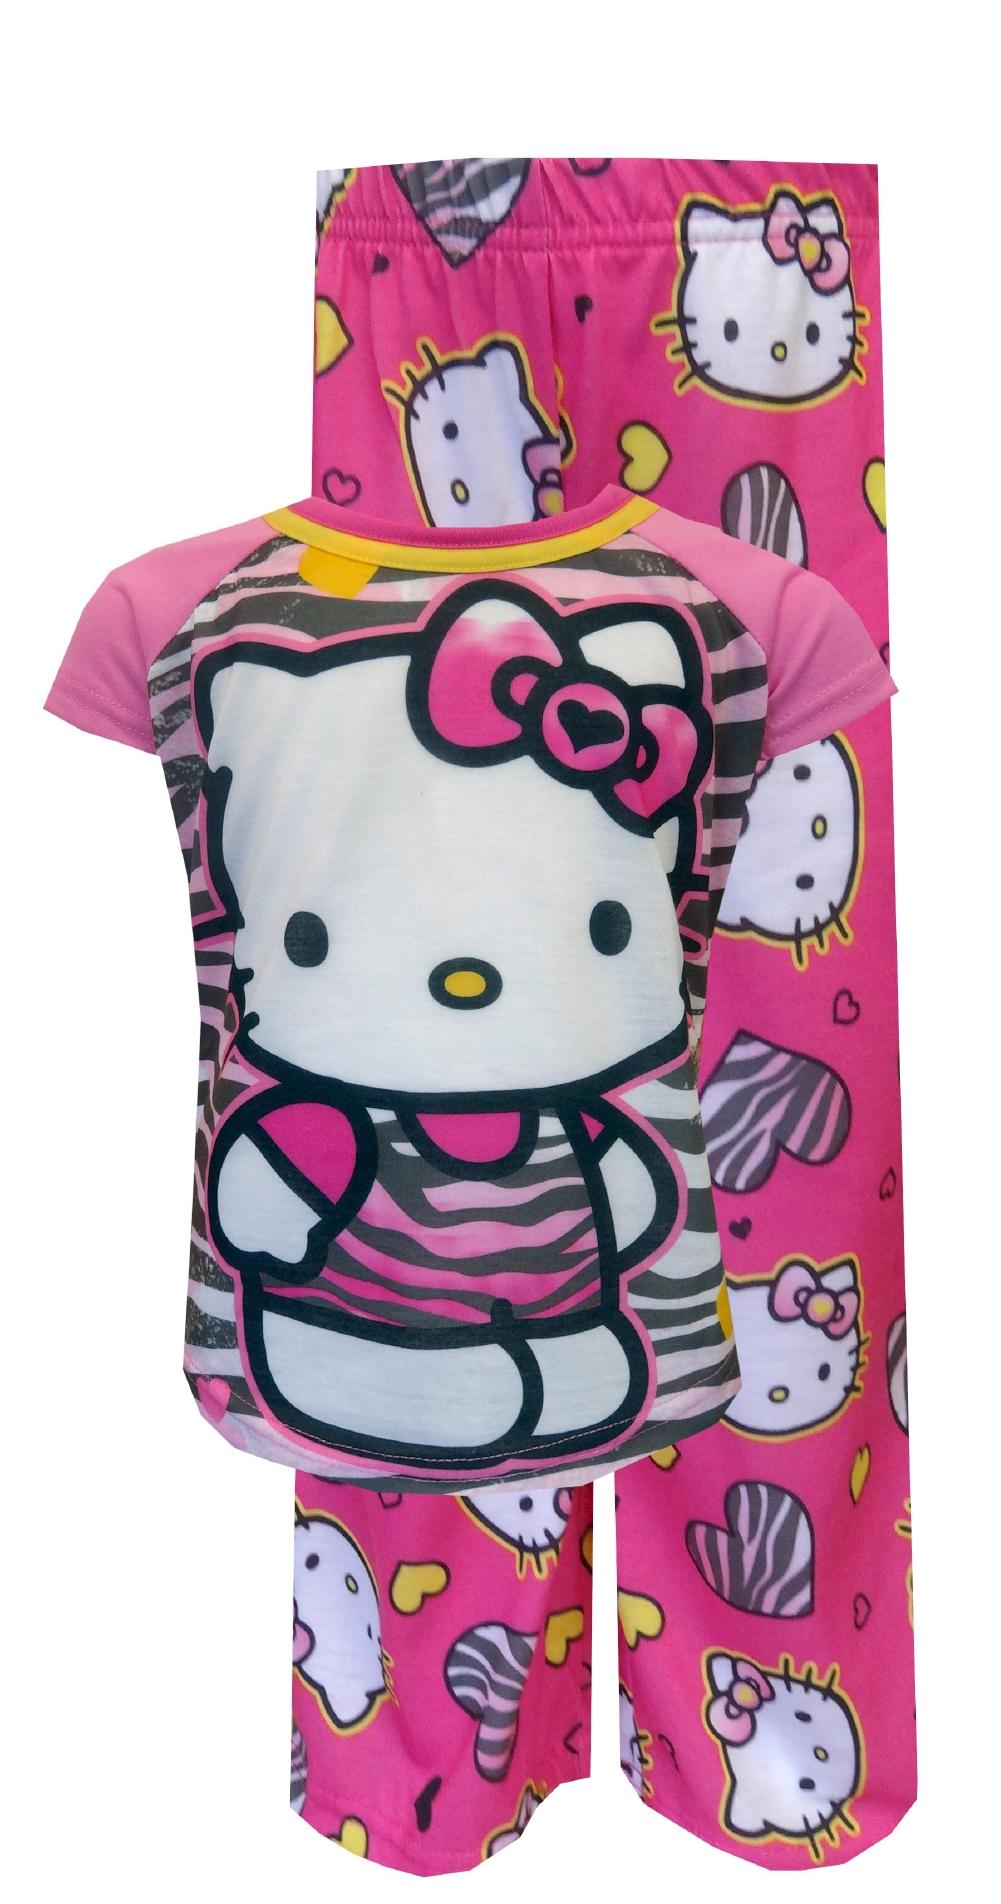 NEW - Cute Hello Kitty Pajamas for Girls